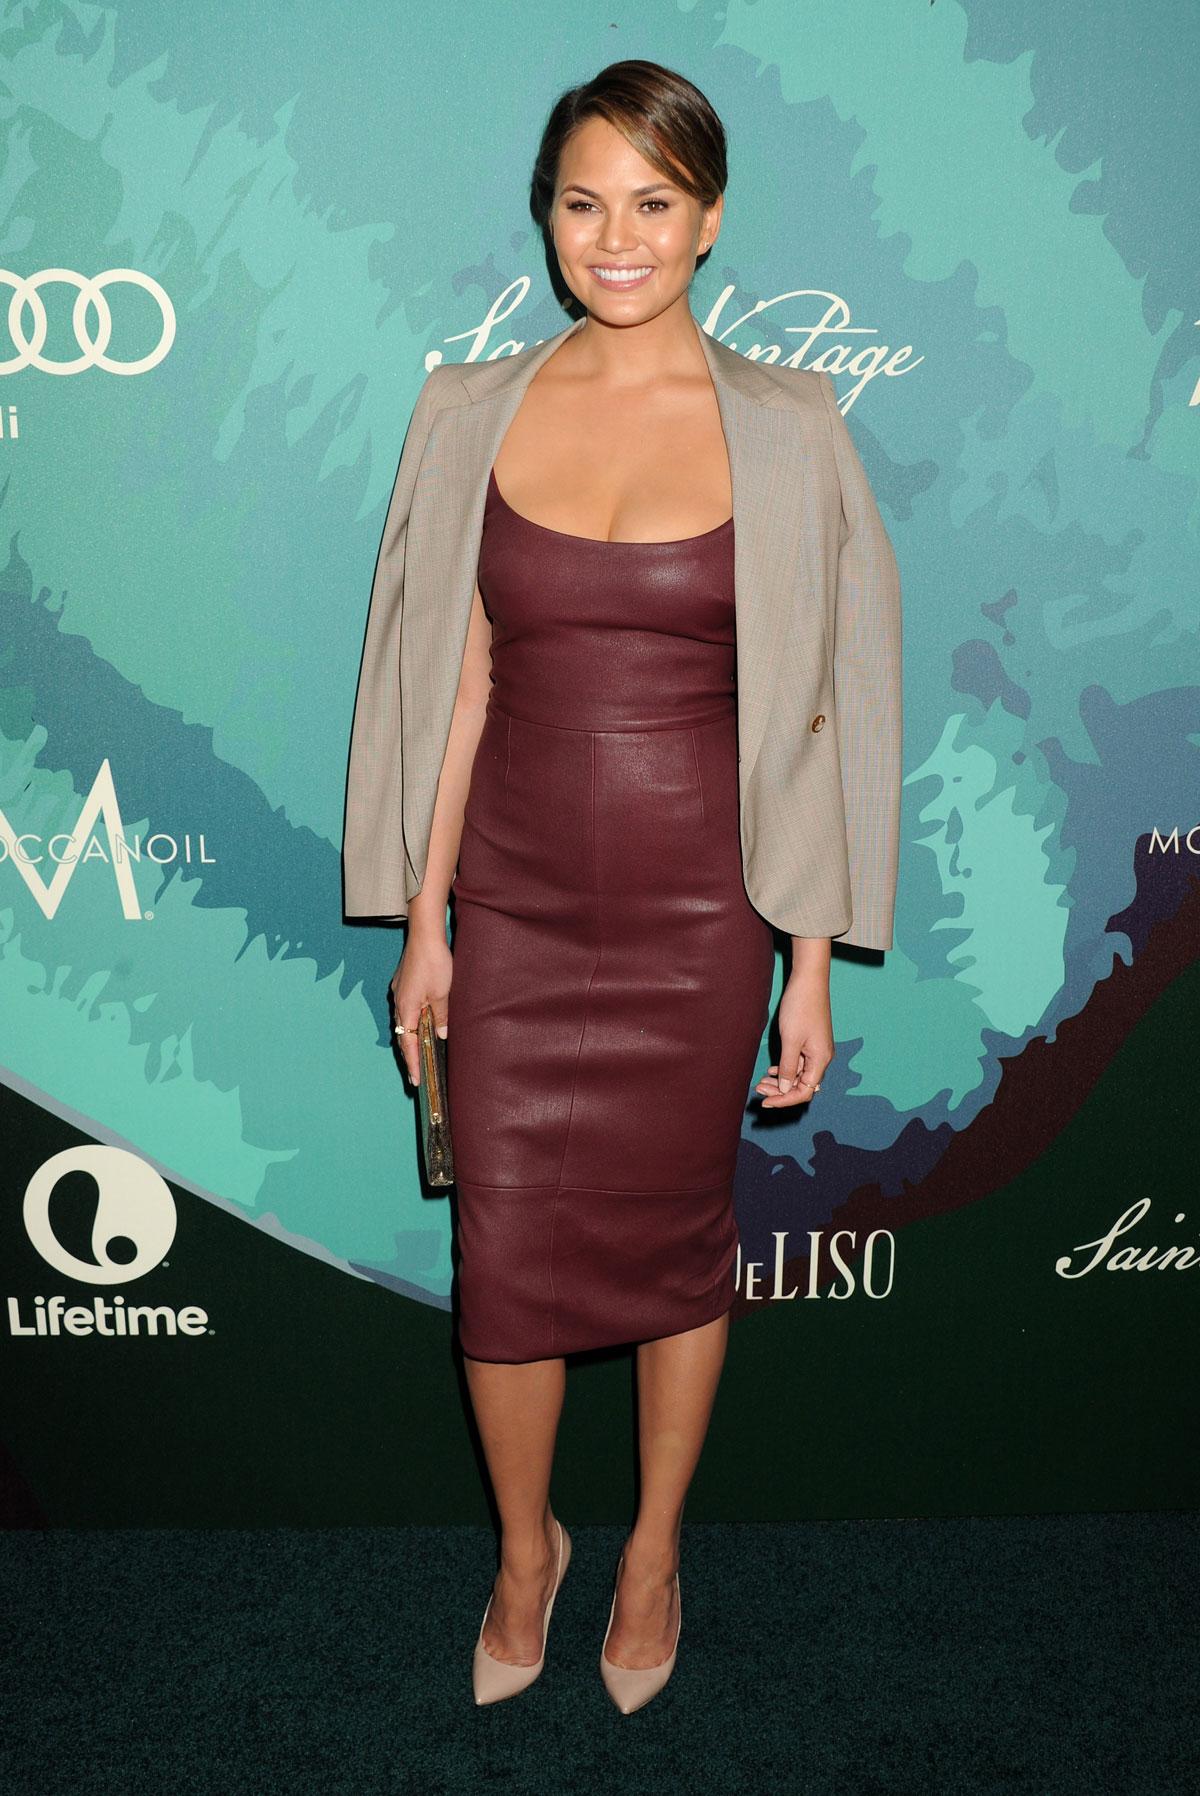 Chrissy Teigen attends 2014 Variety Power of Women presented